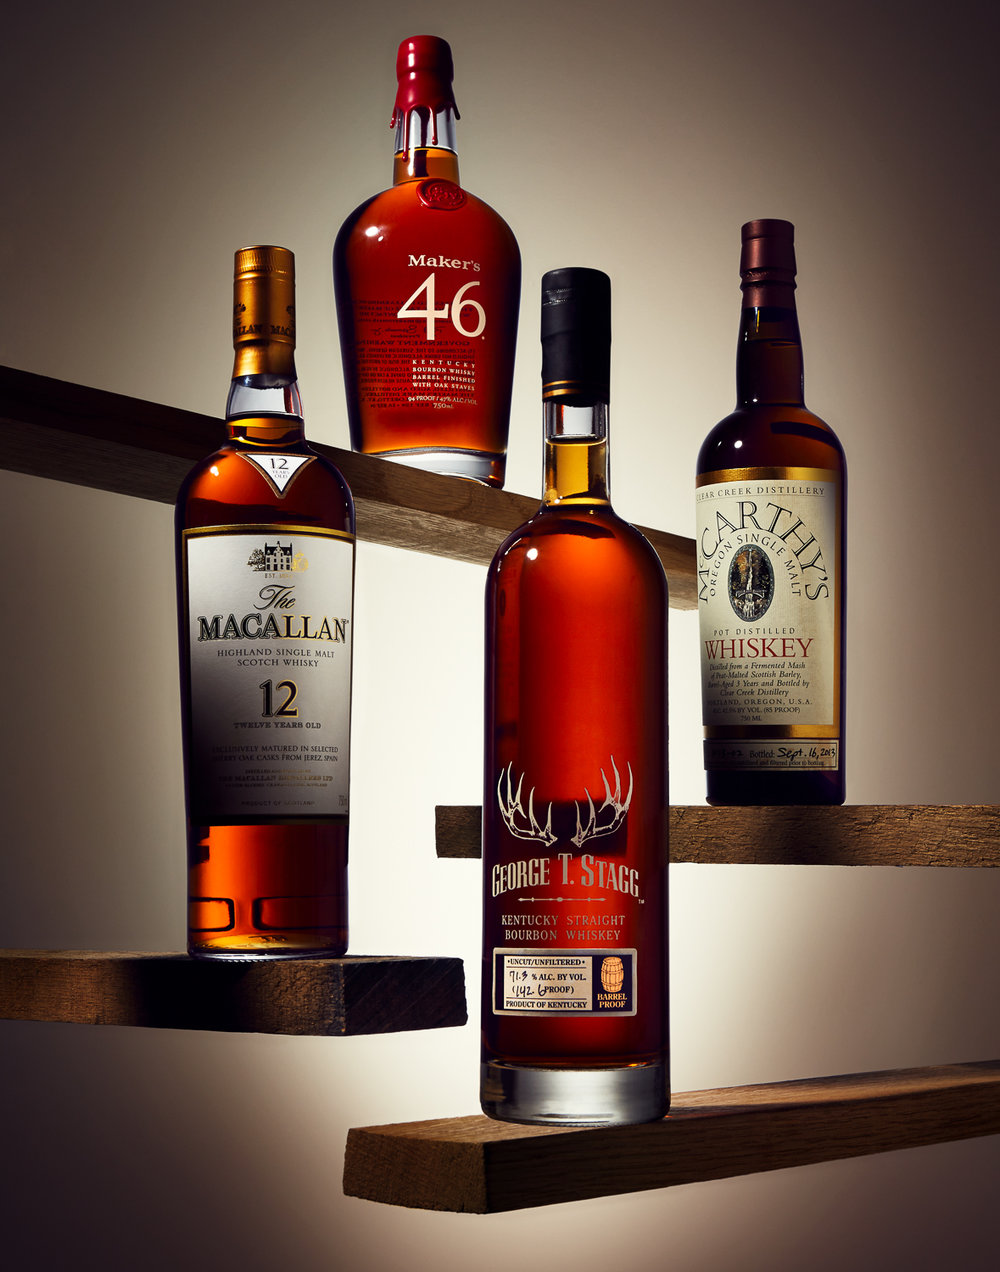 140516 PopMech Whisky L02b.jpg